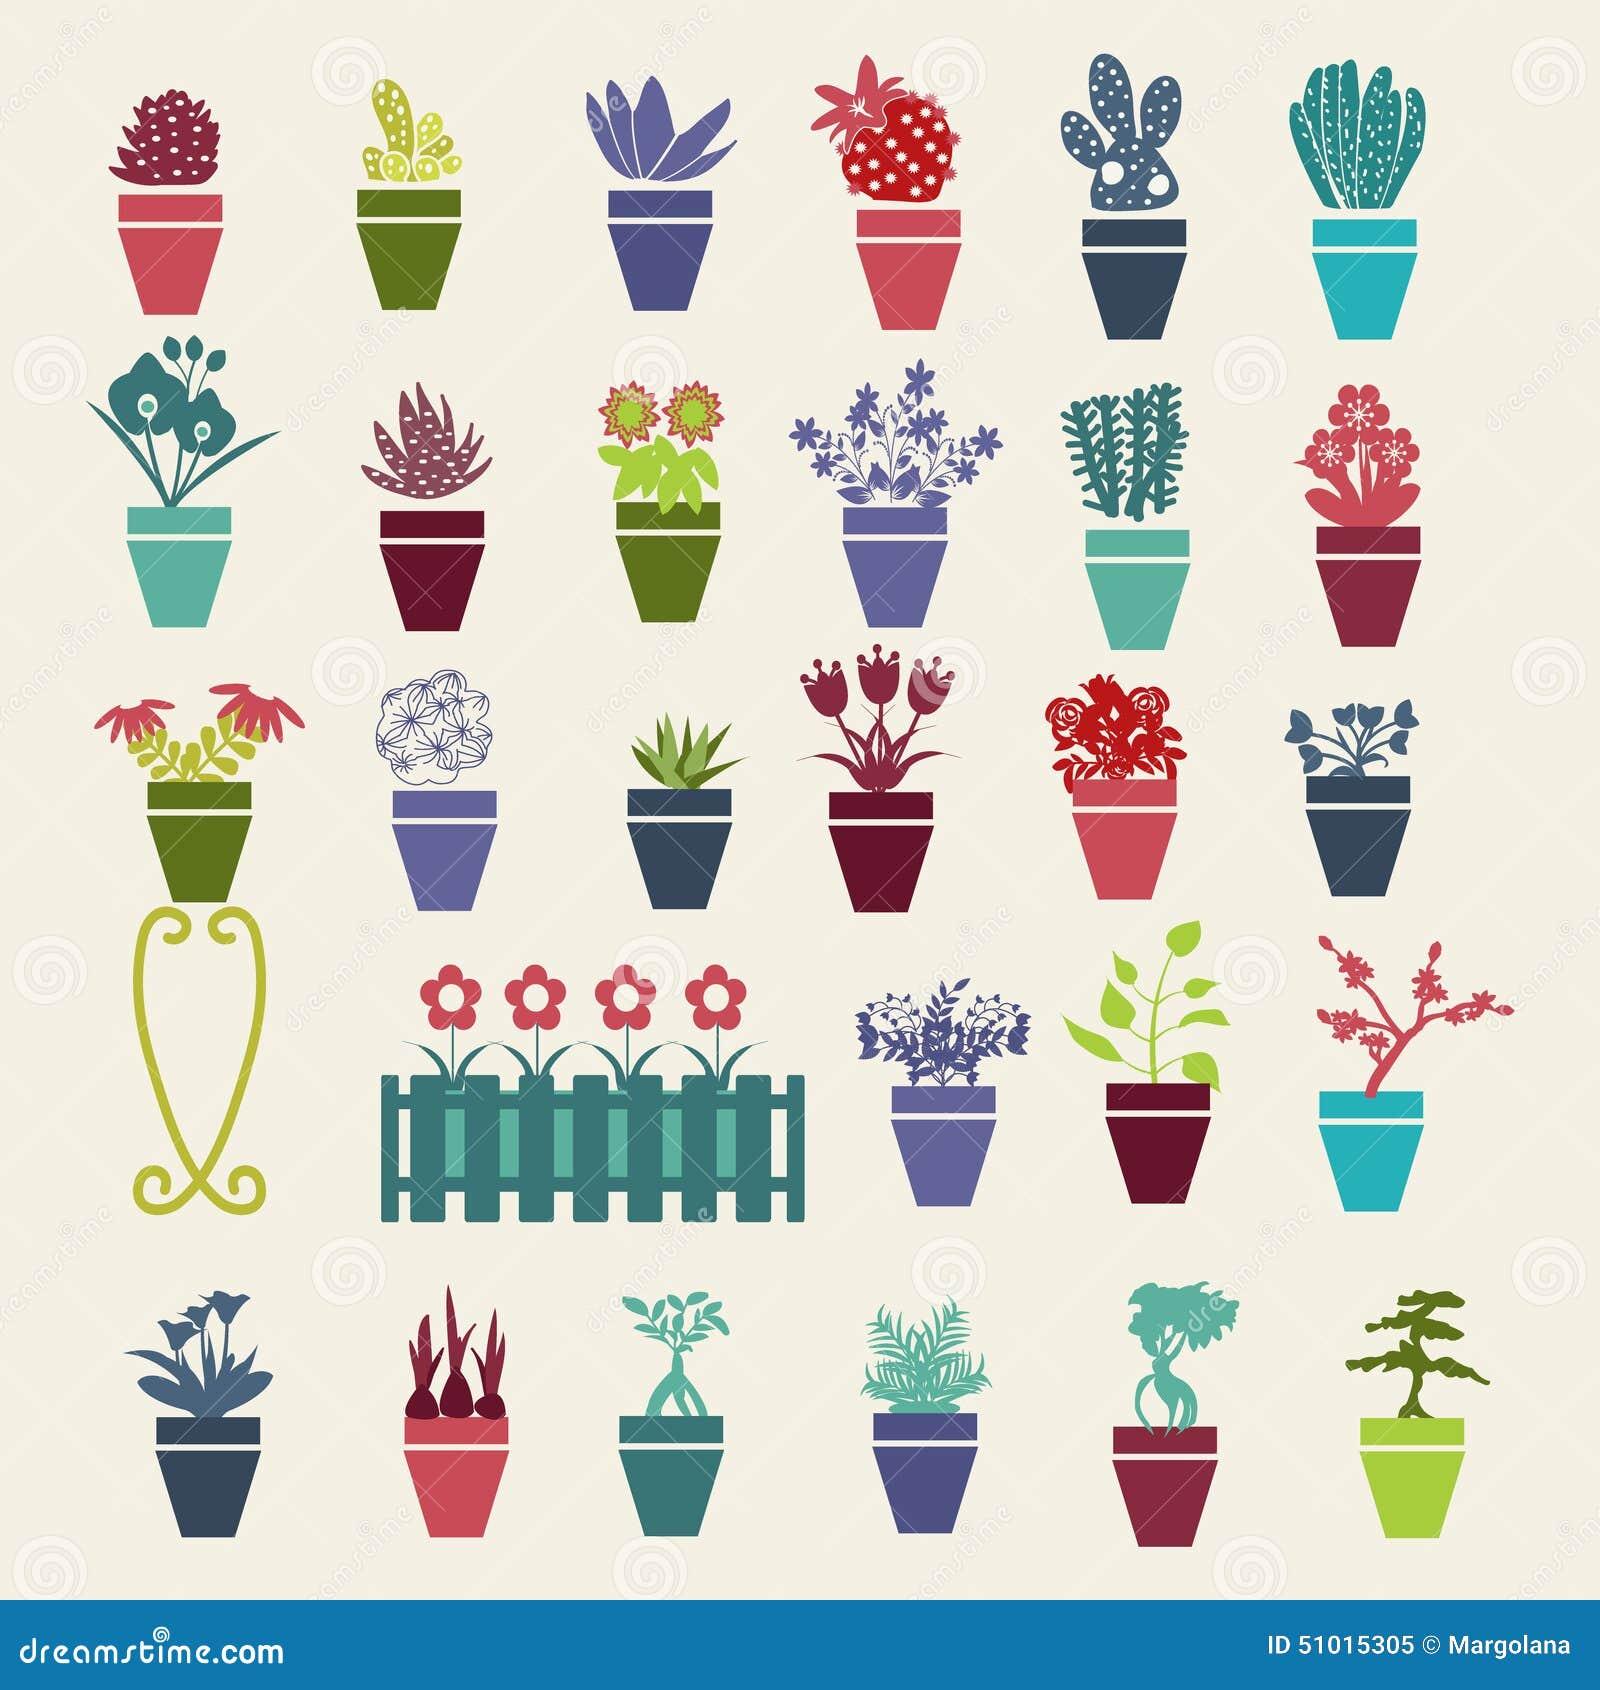 Icones De Plantes En Pot De Fleurs Et D Herbes De Jardin Reglees